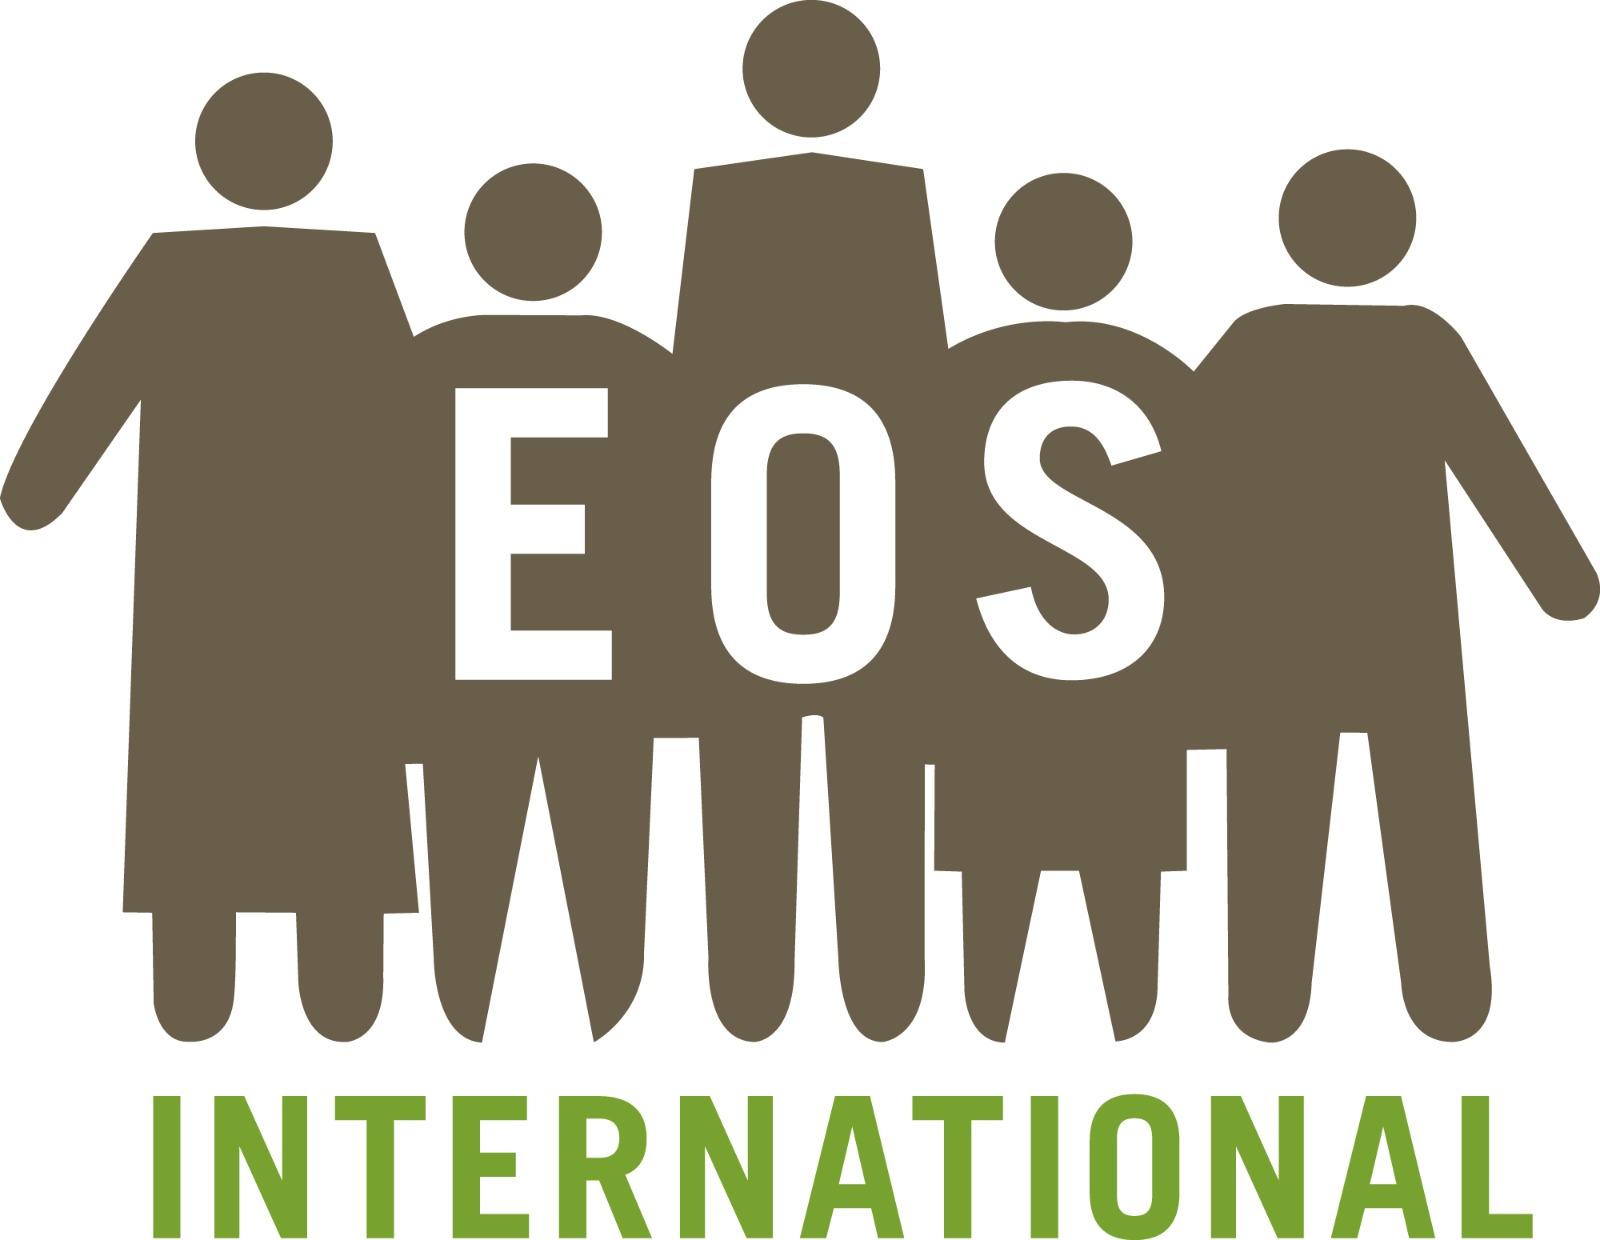 https://honduras.waterforpeople.org/wp-content/uploads/sites/5/2021/04/Logo-EOS.jpeg